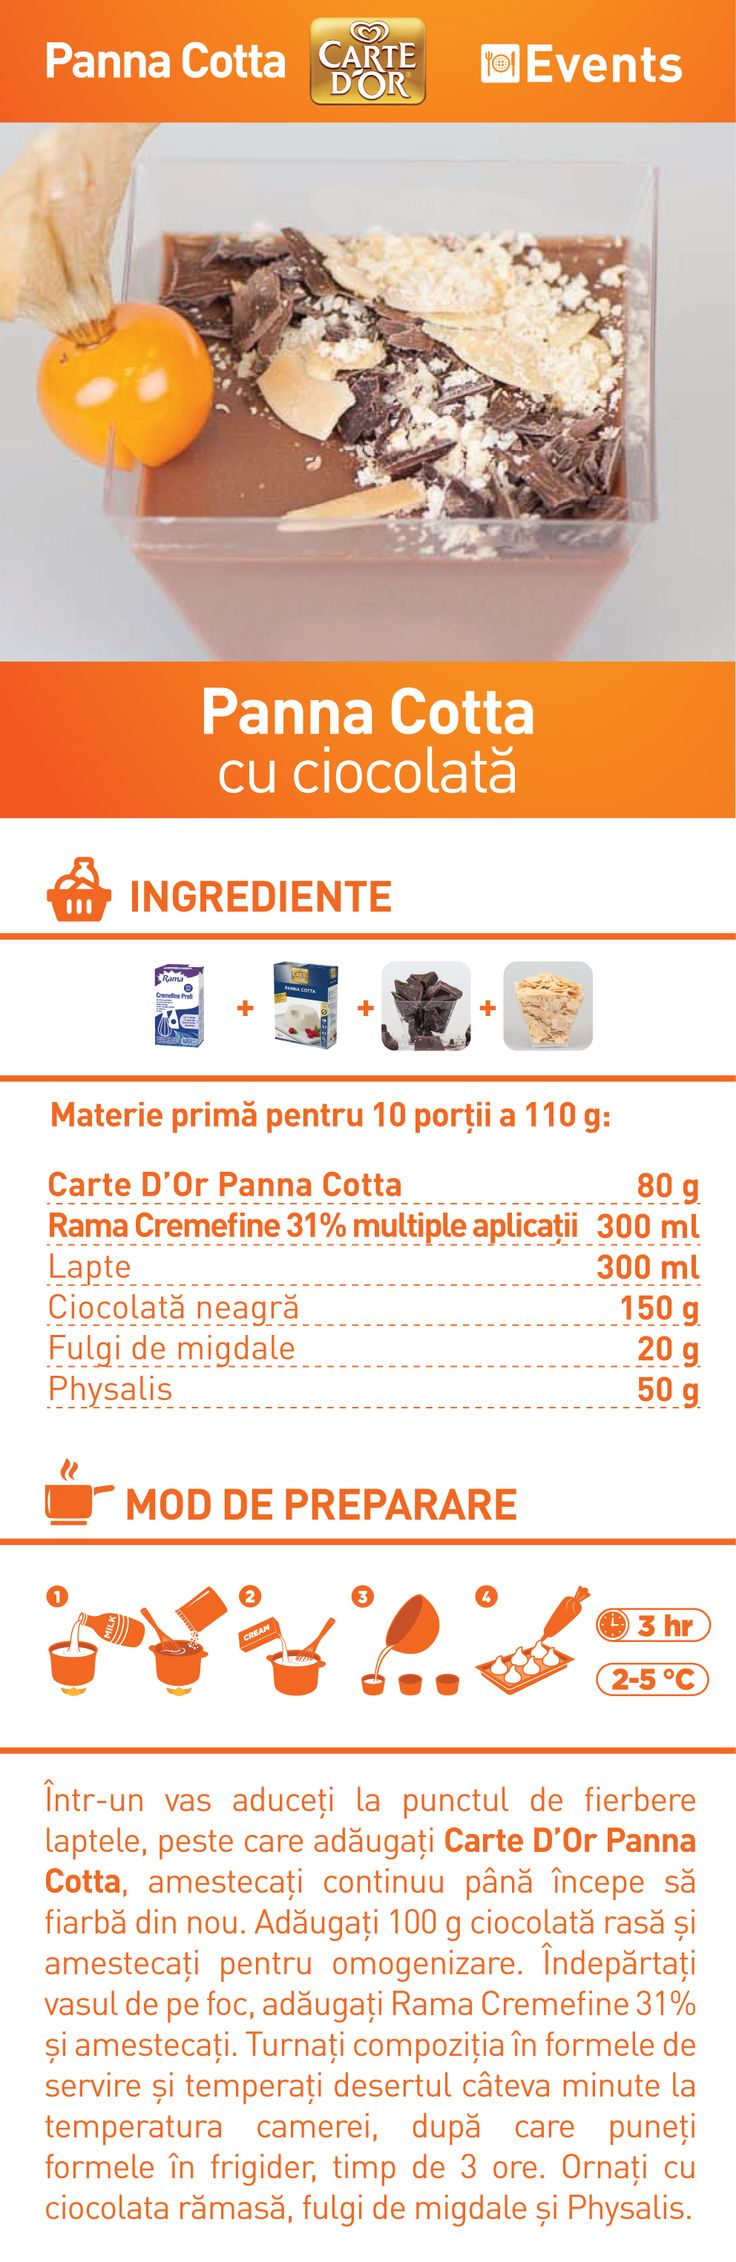 Panna Cotta cu ciocolata - RETETA